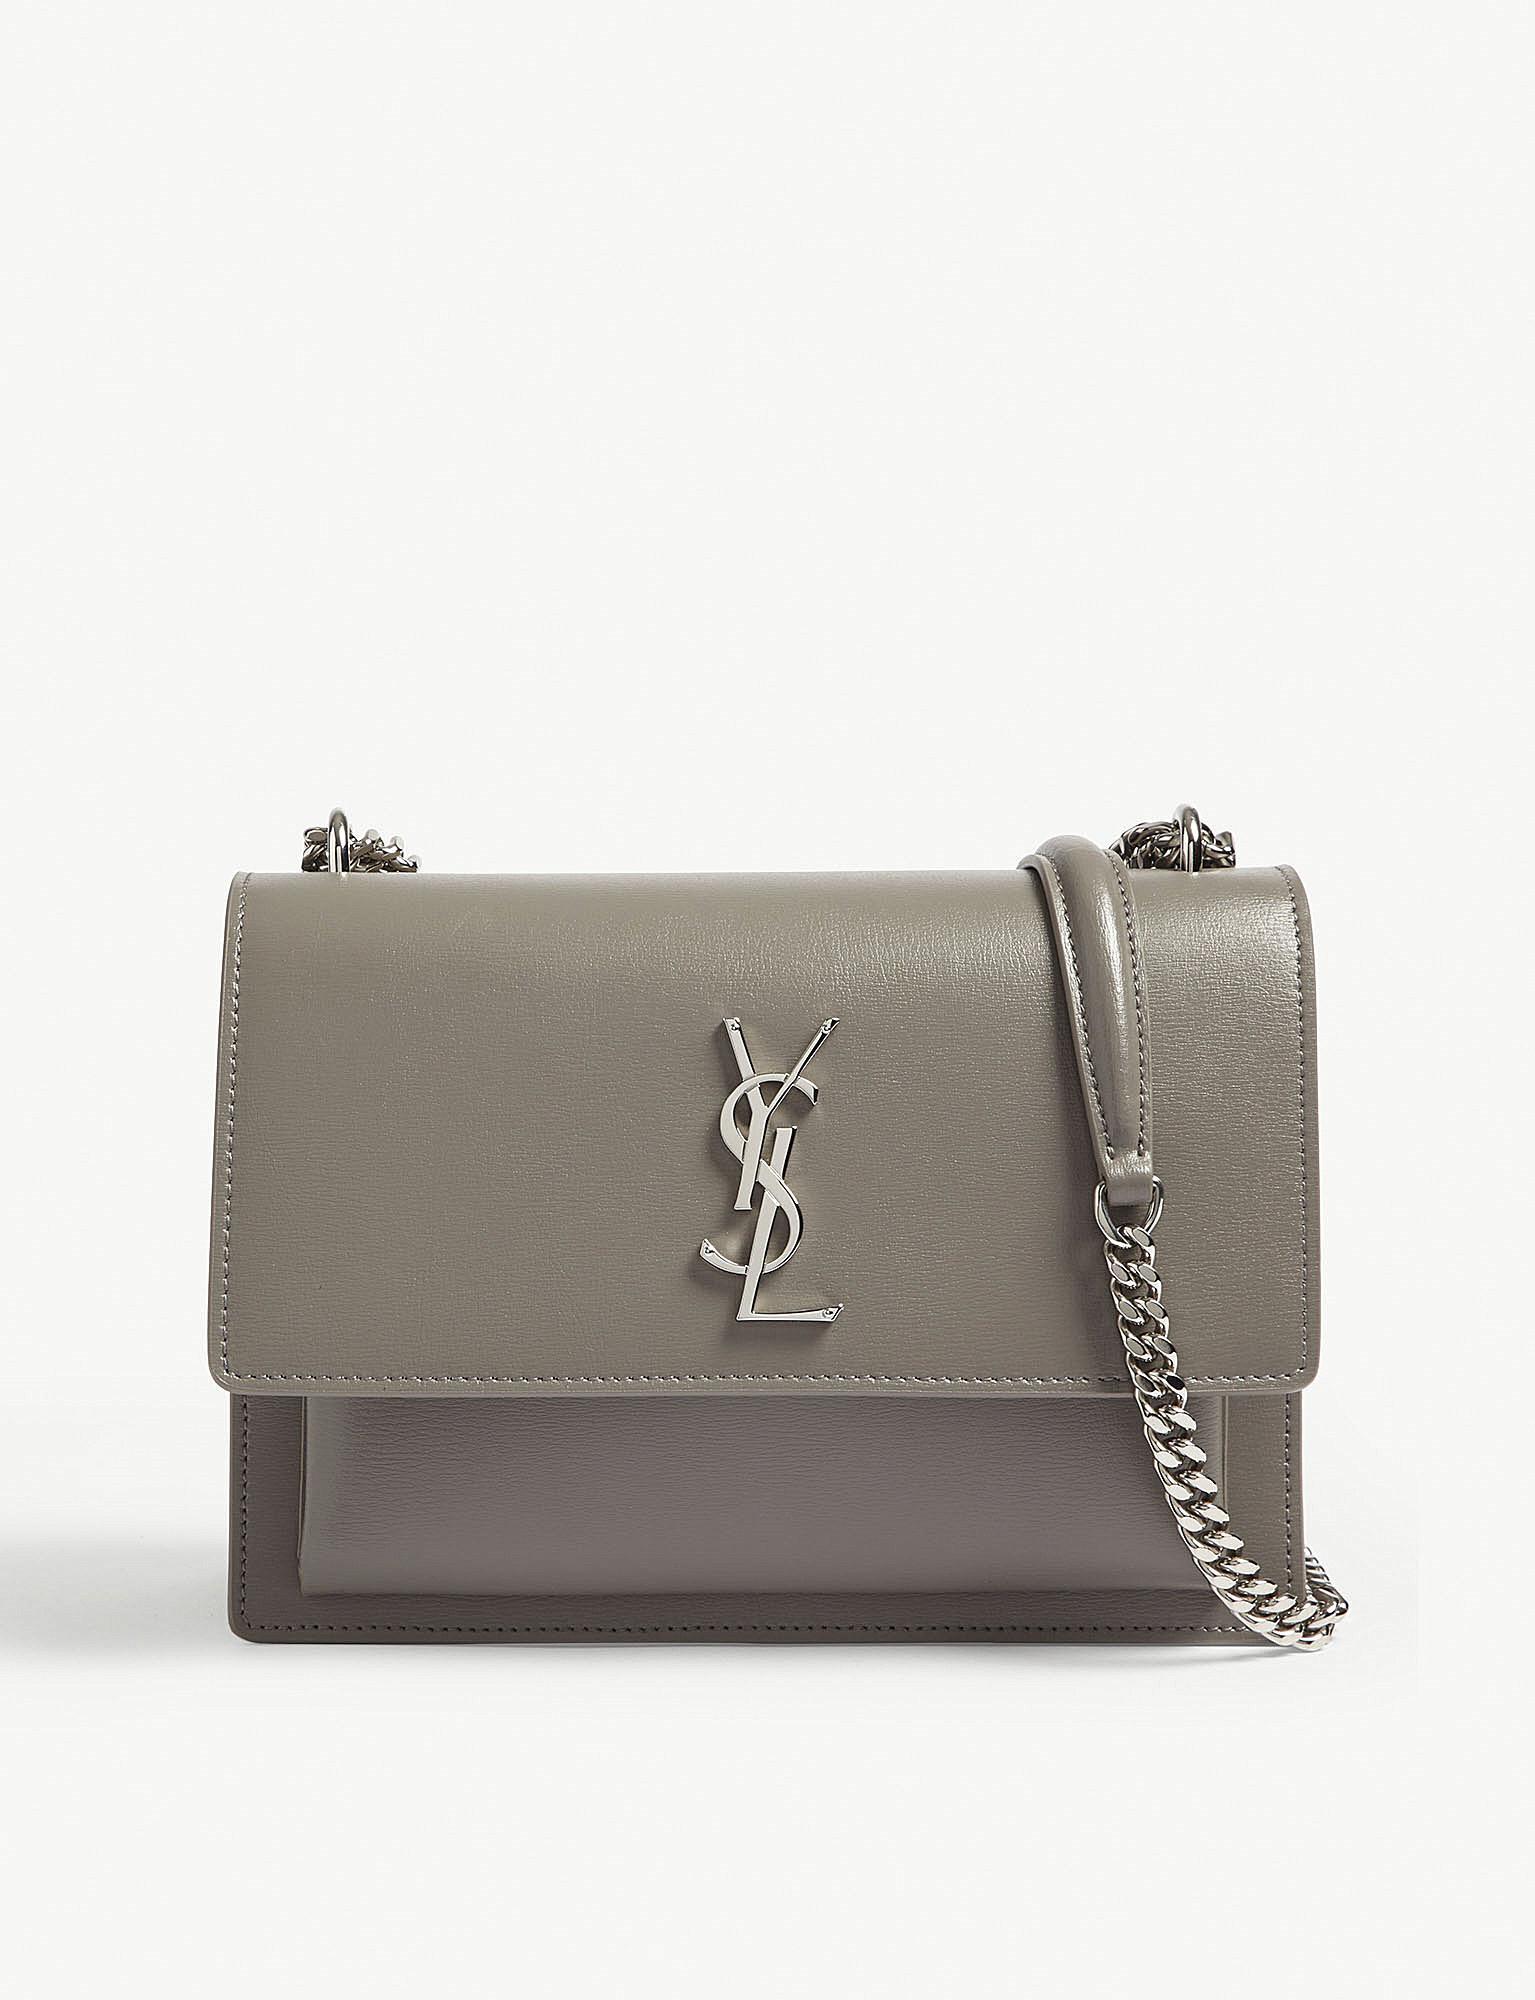 Sunset medium leather cross-body bag Saint Laurent PSHMfnGtRc